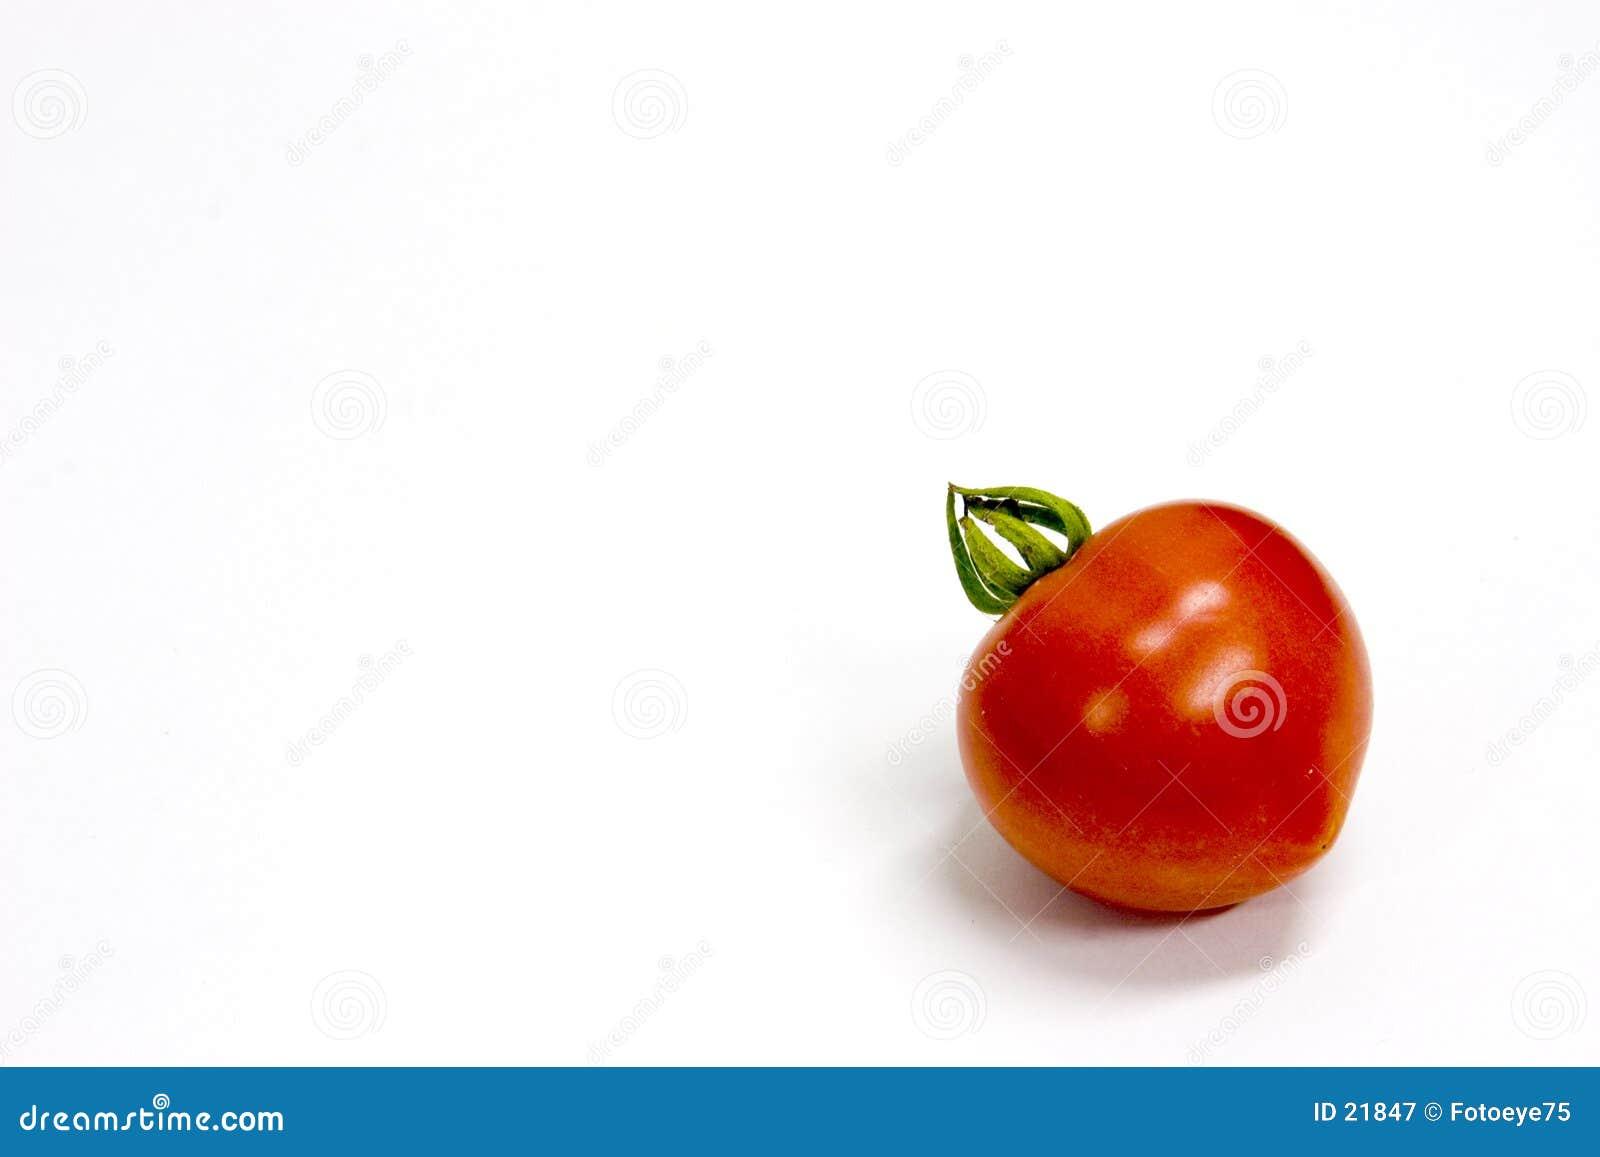 Grape tomatoe